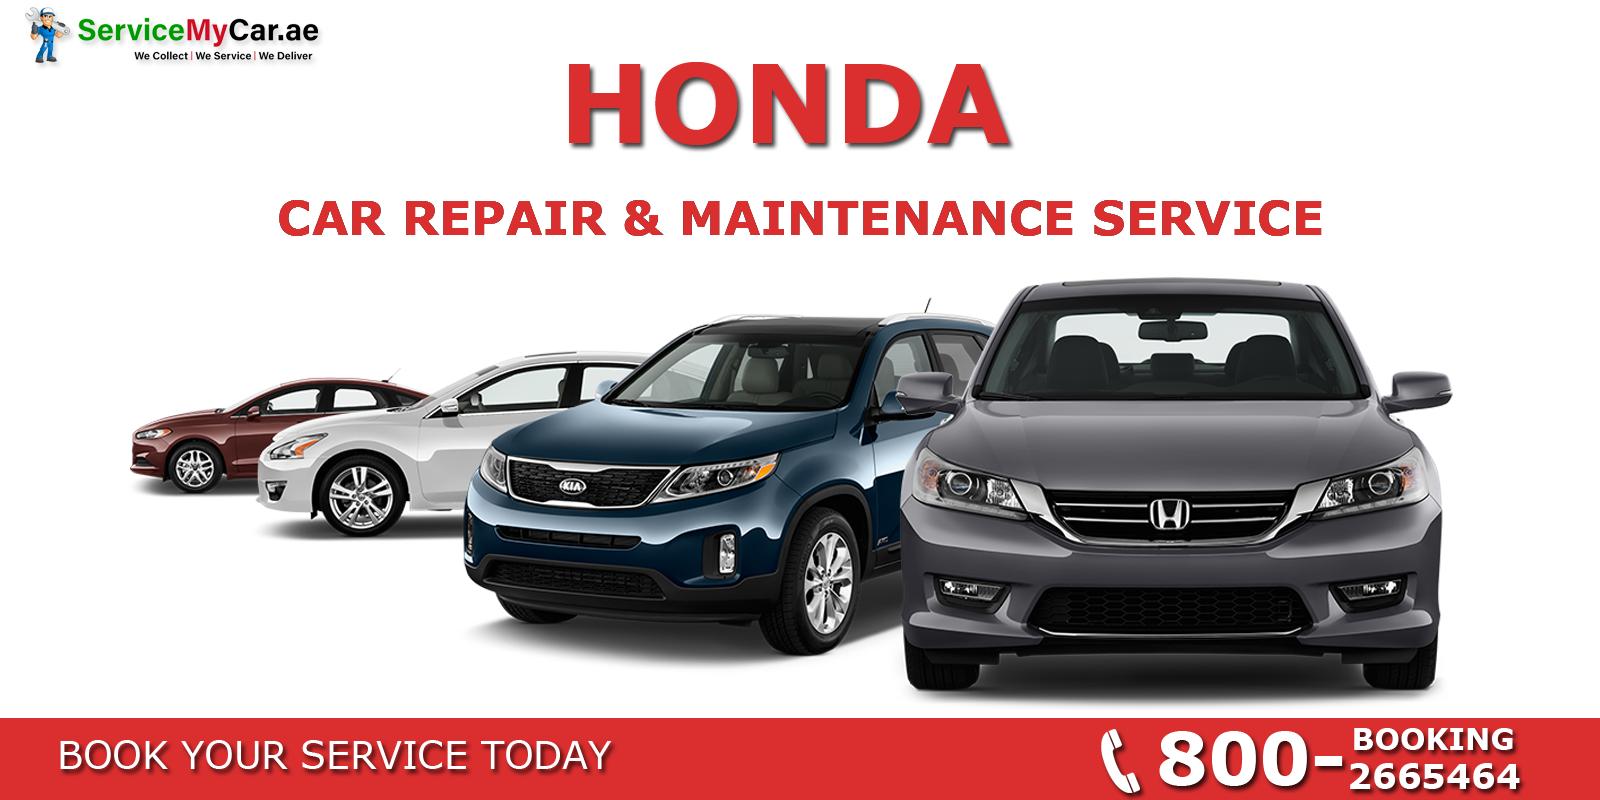 #hondacar service in the UAE now it's easy to get.   Visit servicemycar.ae today and getup 80% off on each Honda Car service.   #car #repair #maintenance #garage #servicecenter #autorepairs #bestgarage #honda #dubai #uae #ajman  #businessbay #nearme